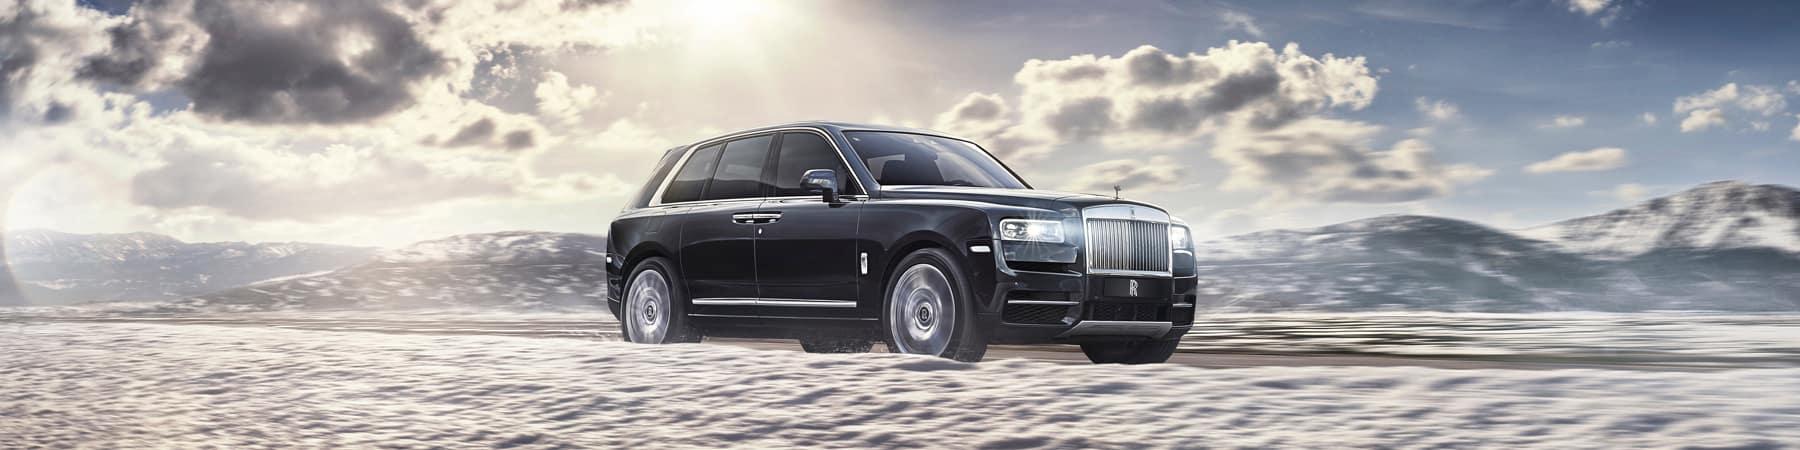 New Rolls-Royce Cullinan for Sale in Charleston, SC